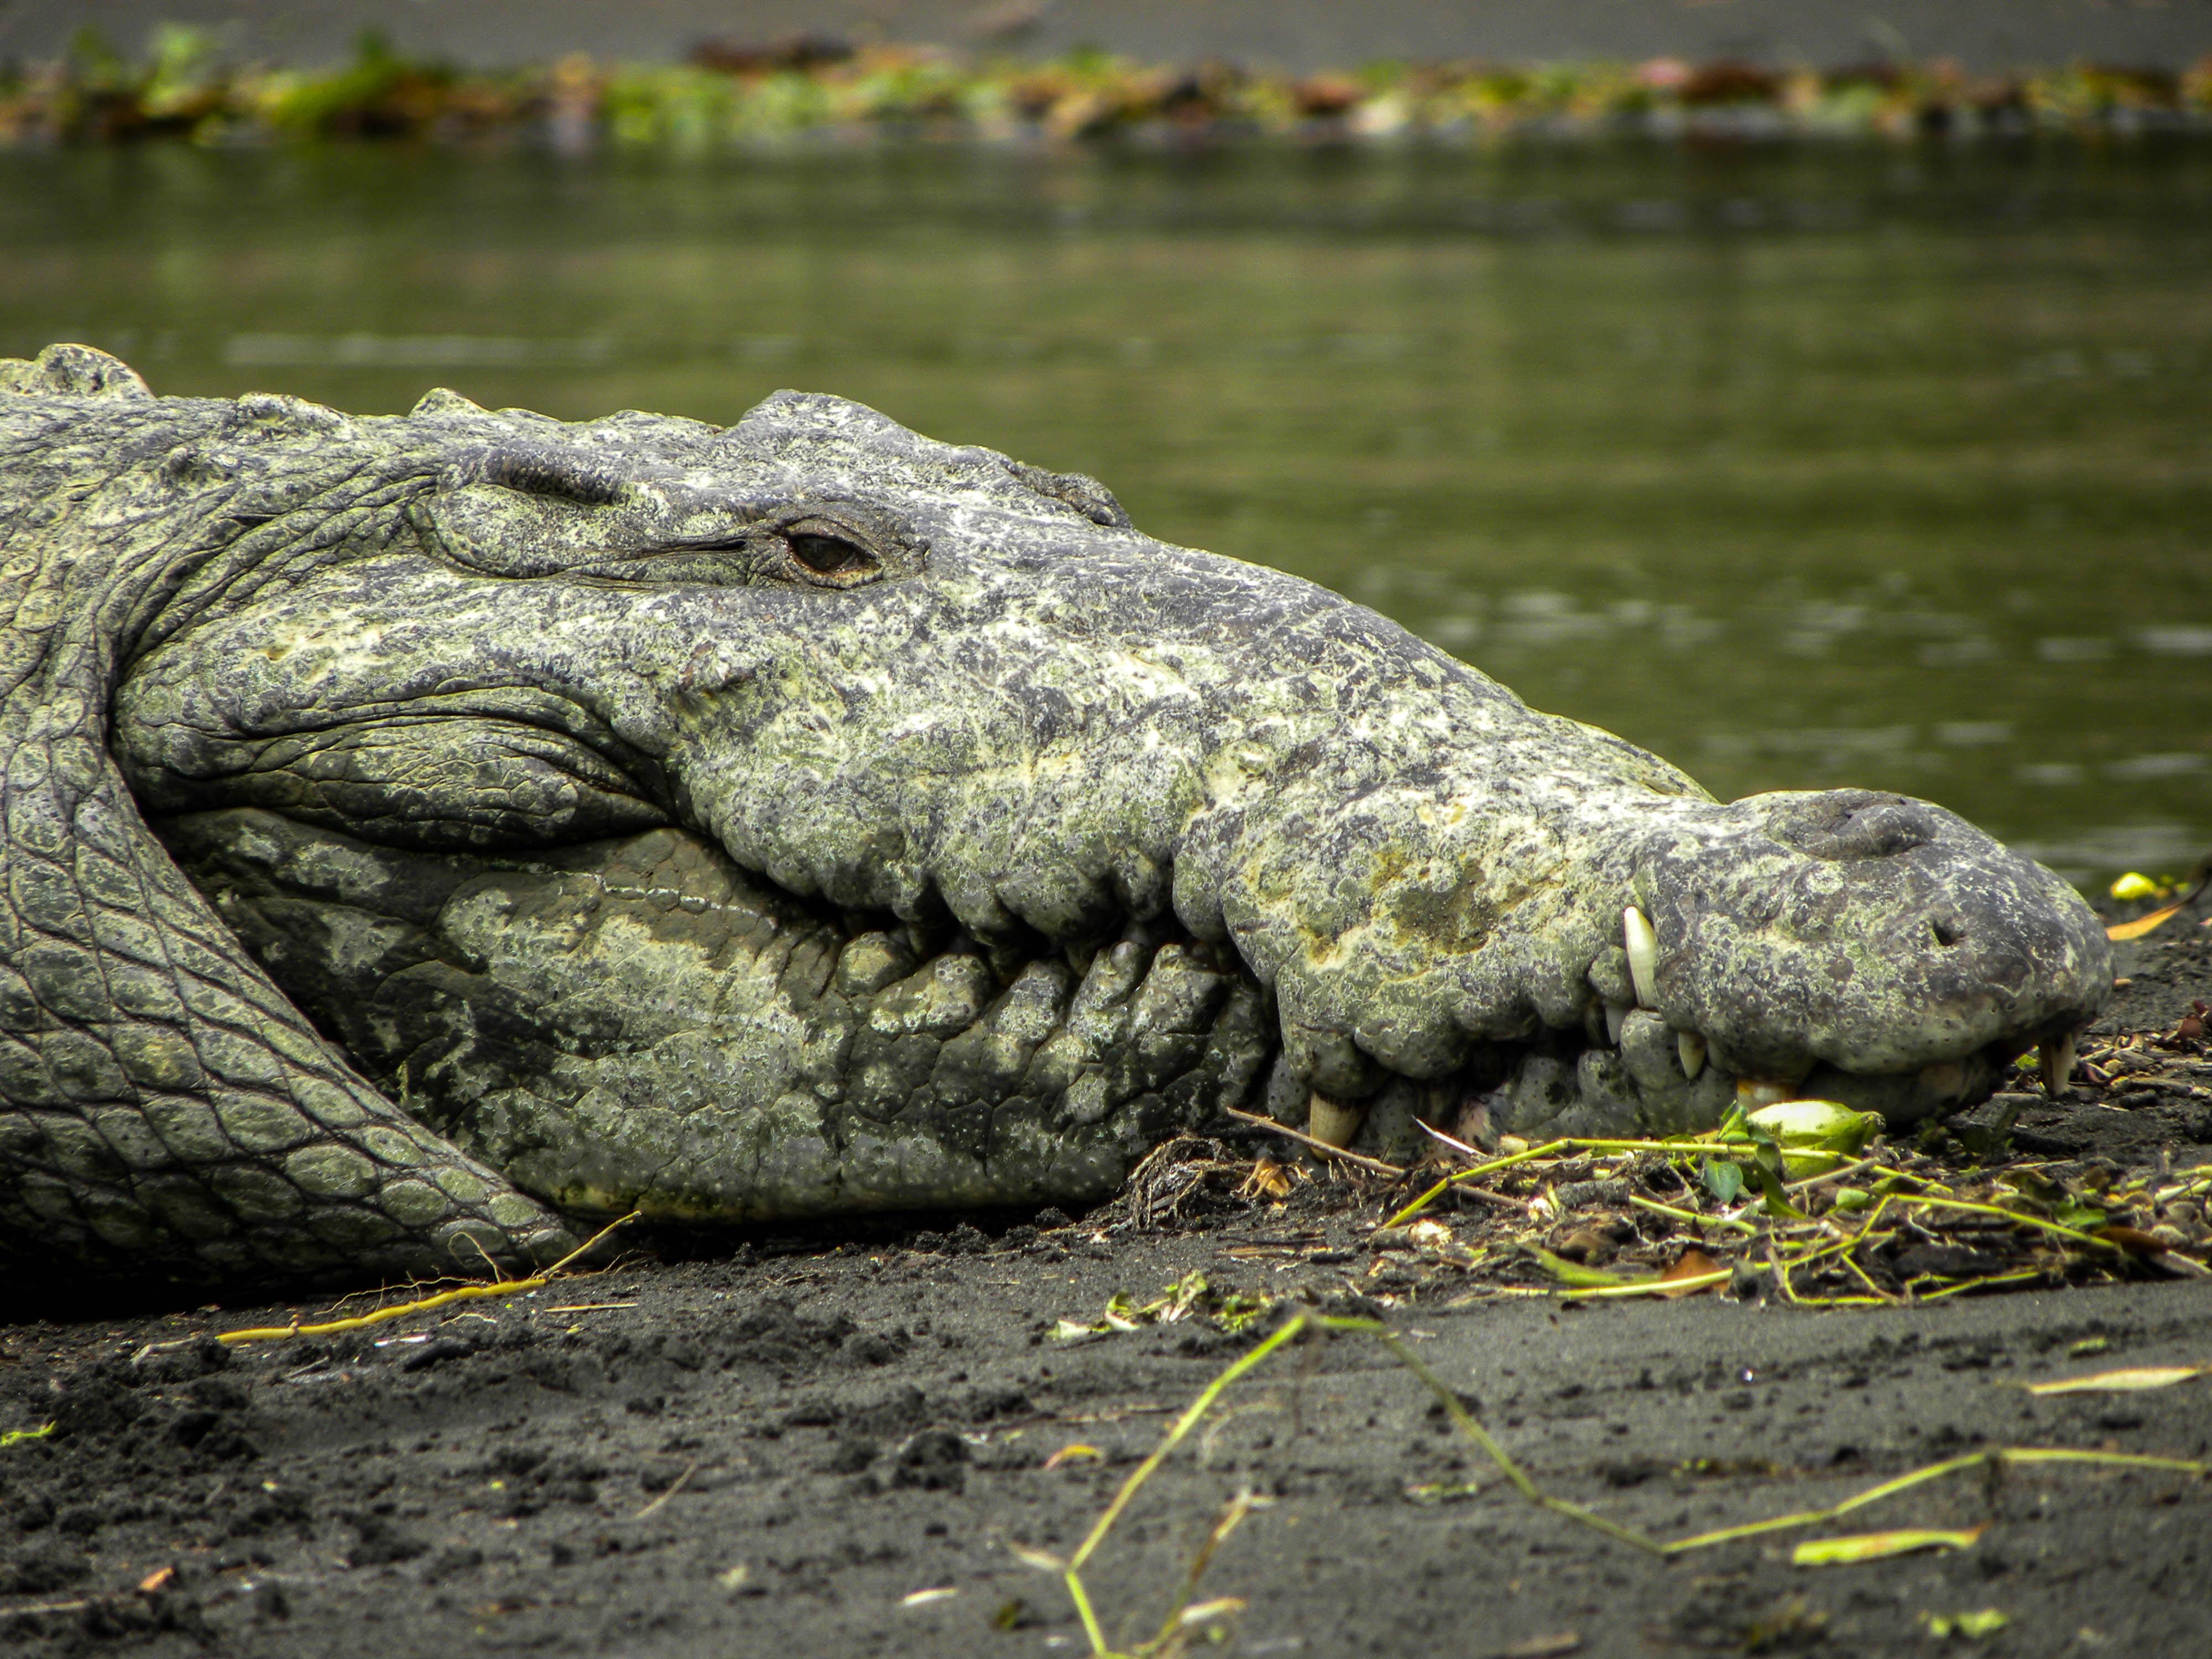 brown alligator near body of water